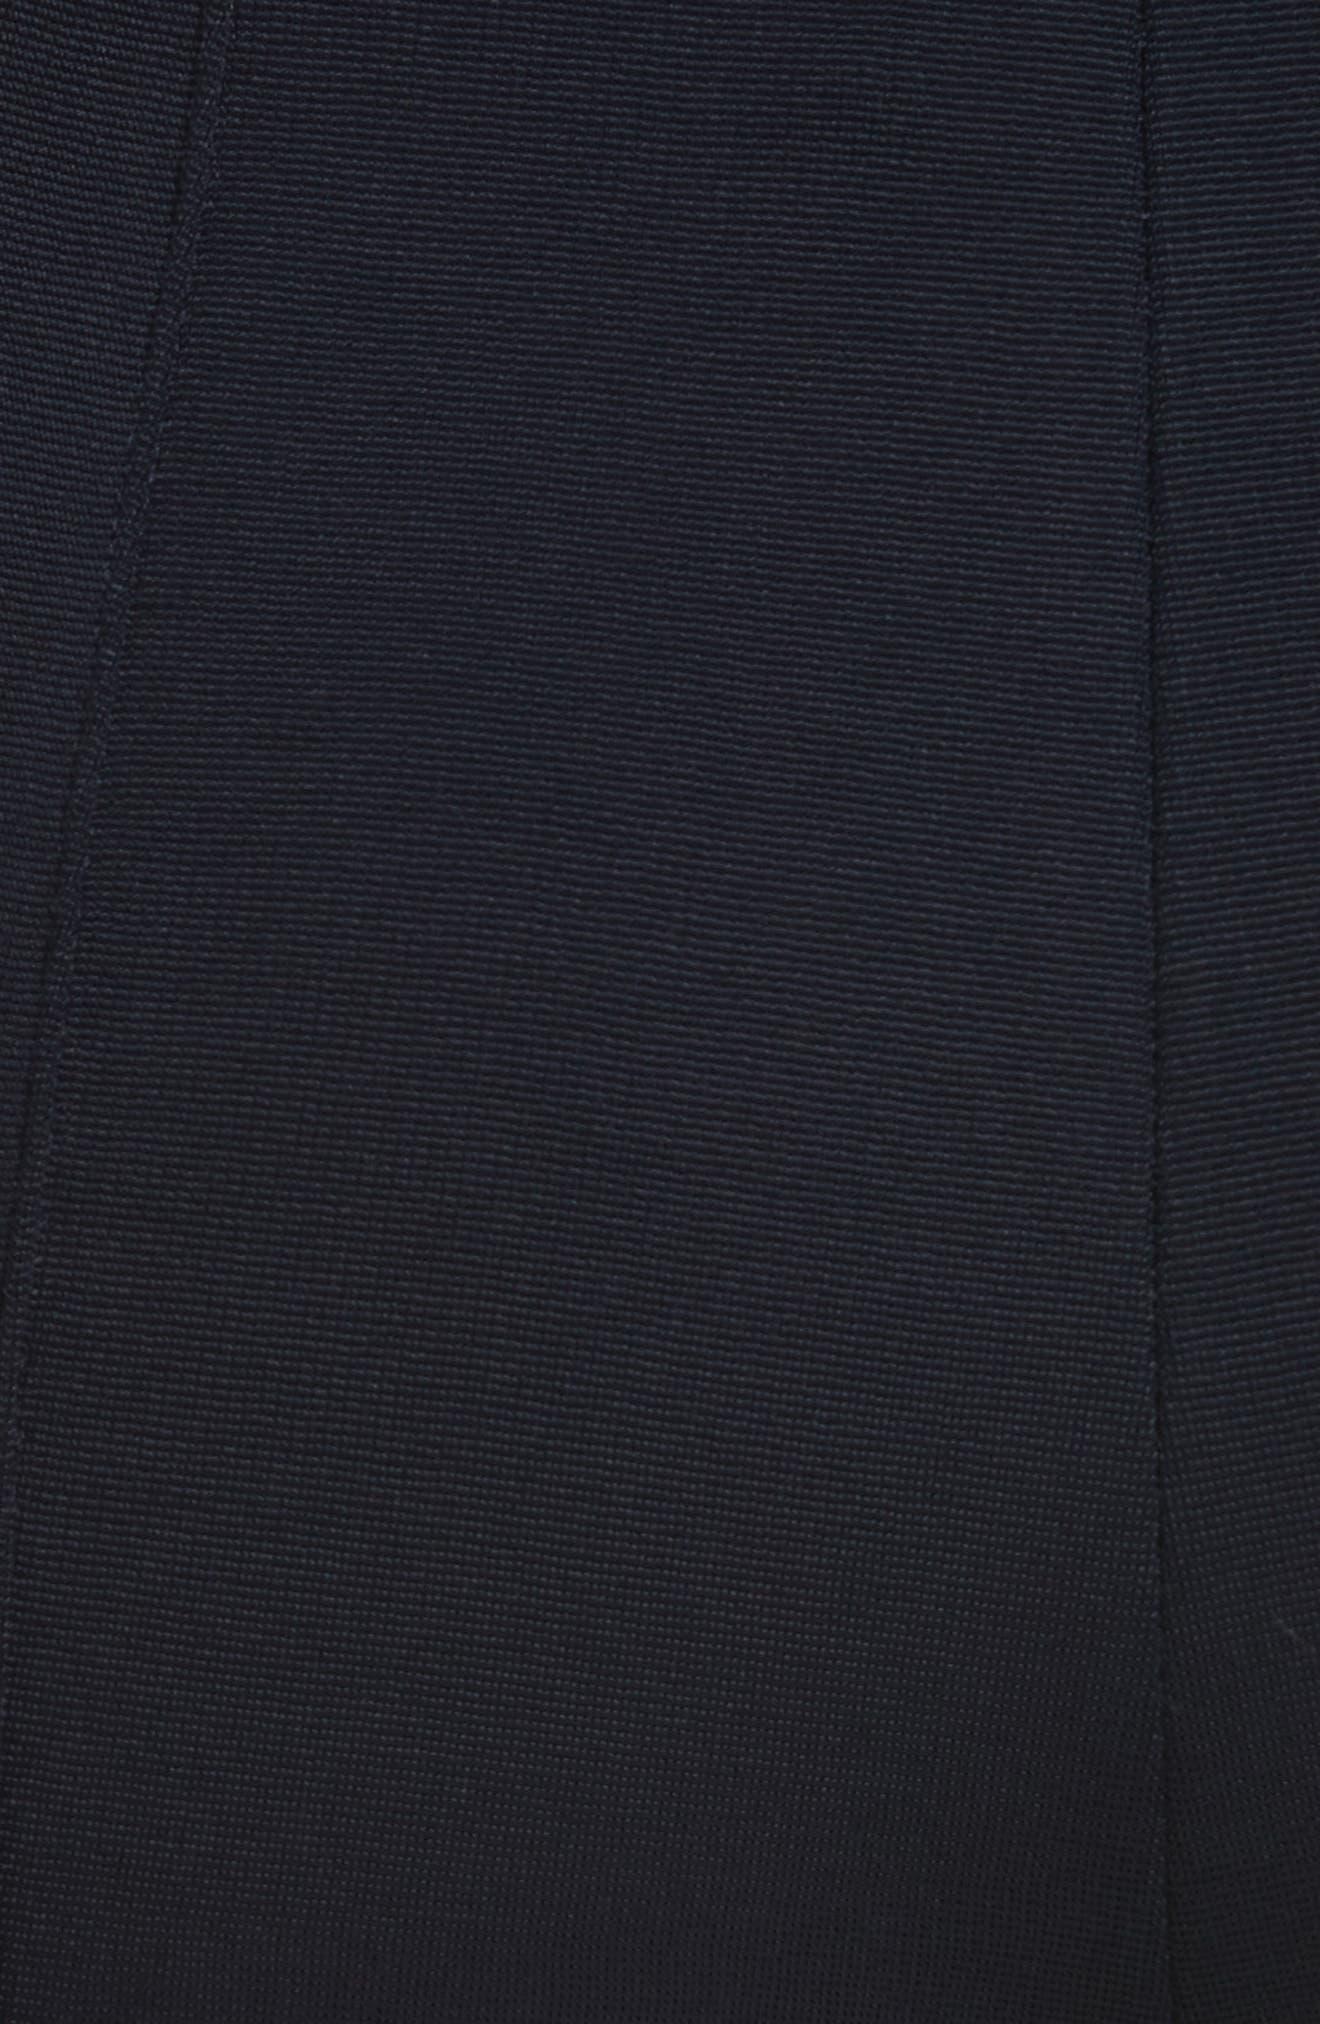 Diane von Furstenberg High Waist Skinny Pants,                             Alternate thumbnail 5, color,                             403